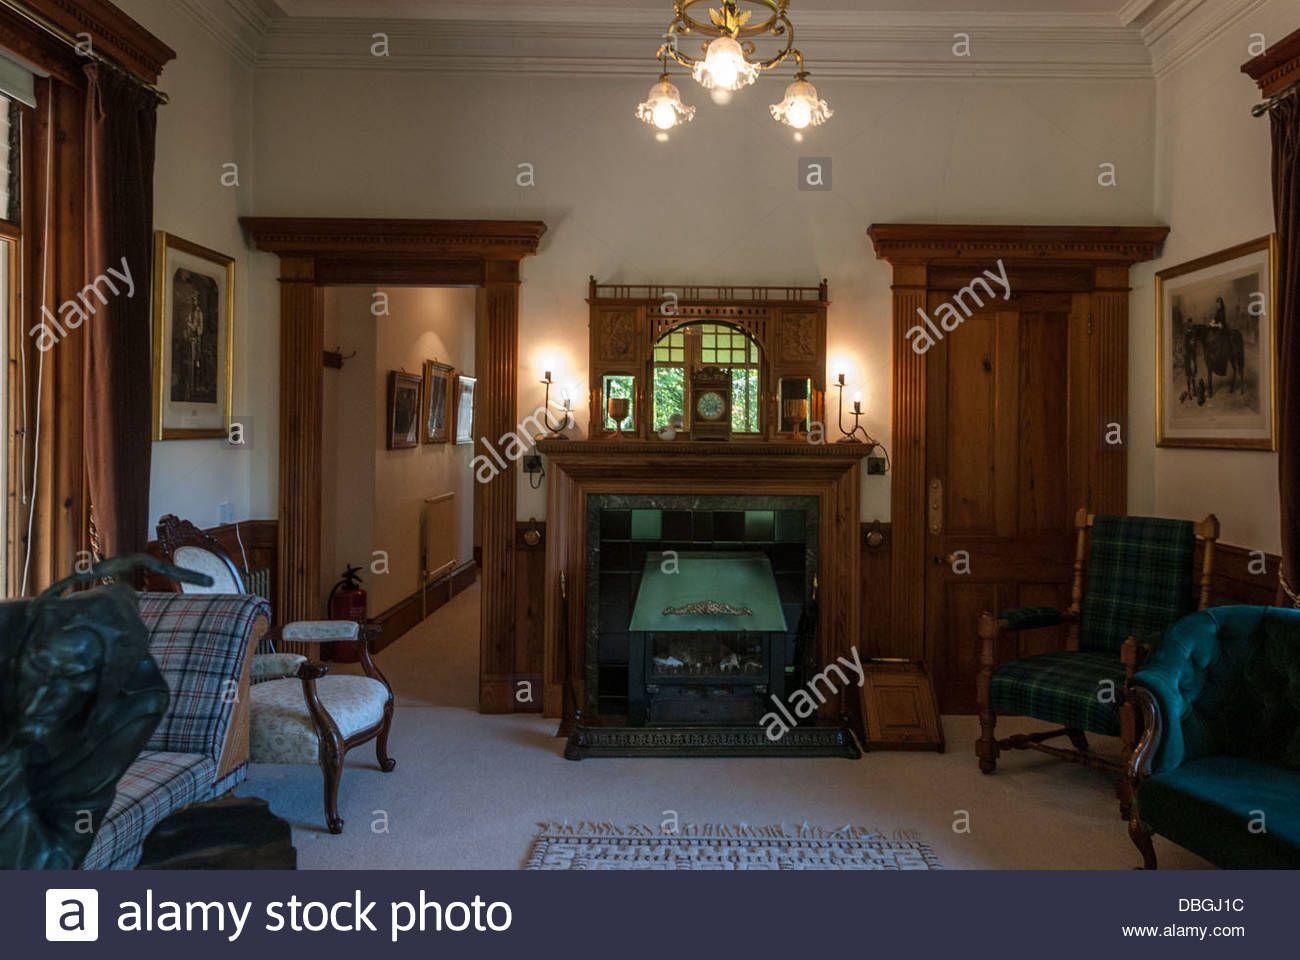 Download this stock image: Inside Garden Cottage, Balmoral Castle